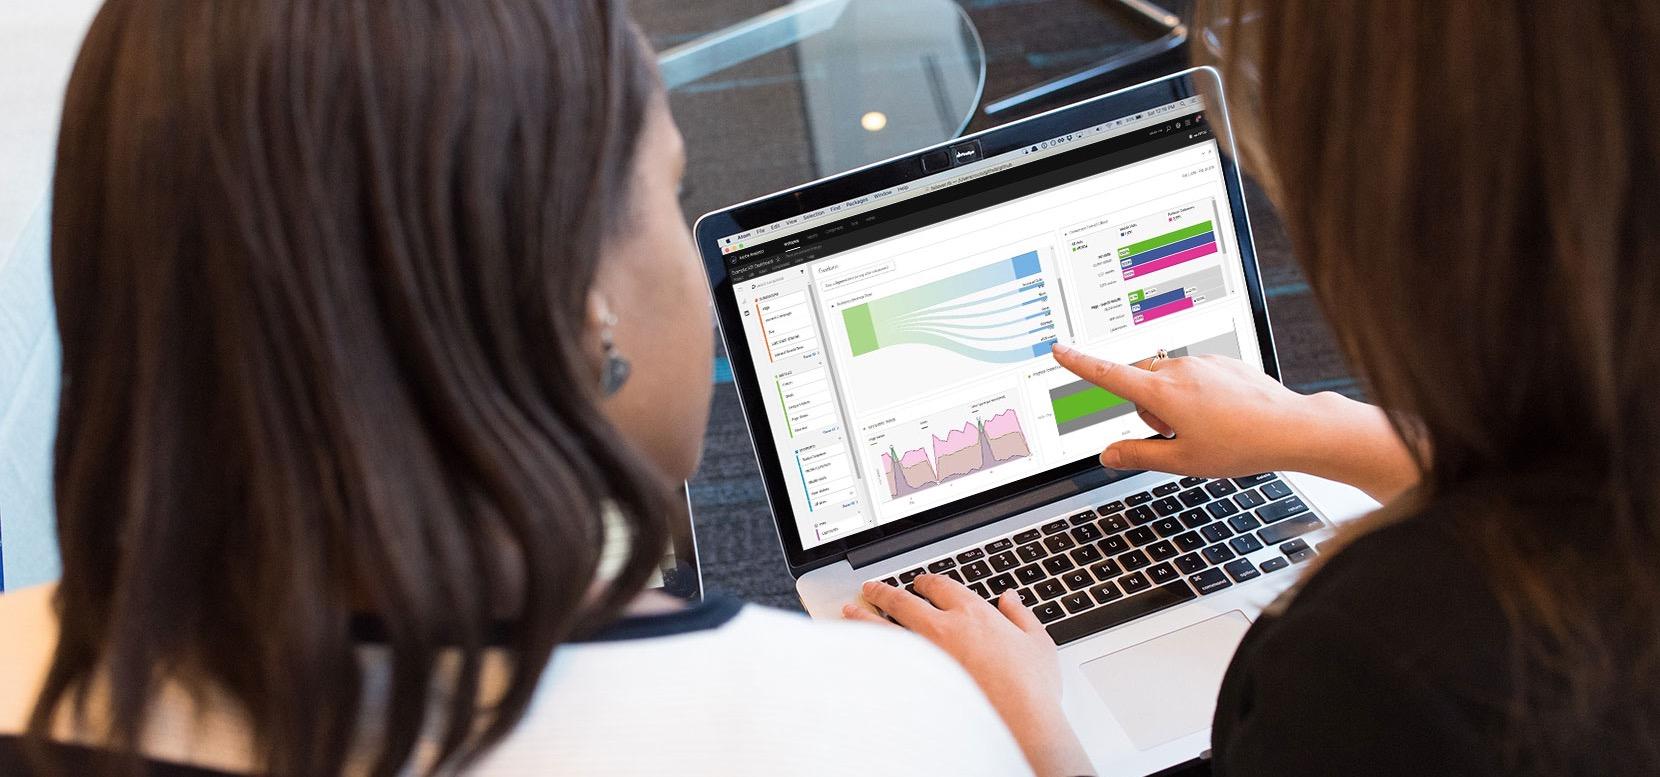 image of analytics tools on laptop